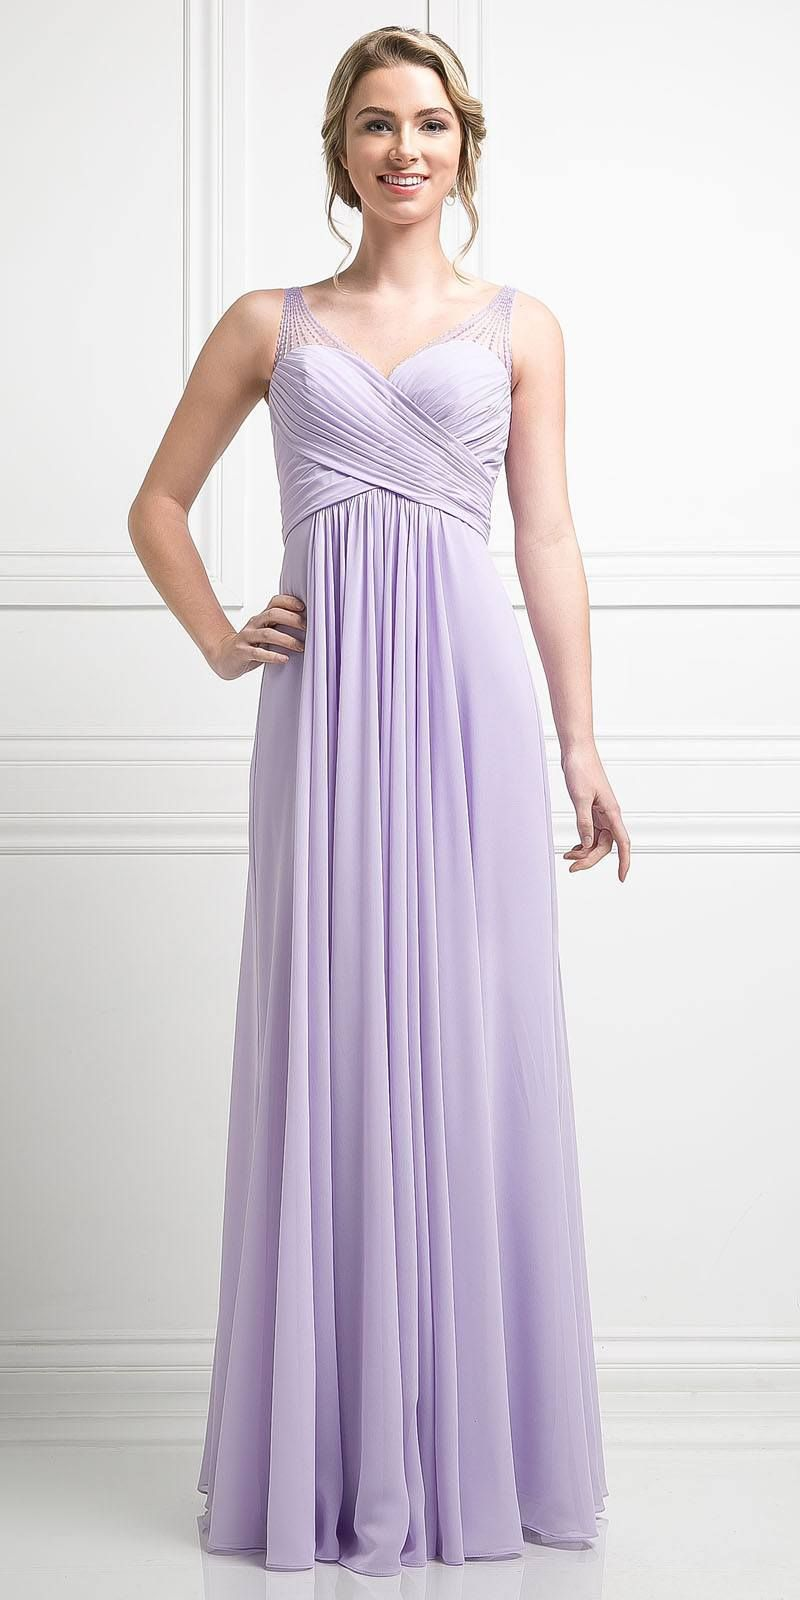 4996278d924 Red Long Formal Dress V-Neck Pleated Bodice Empire Waist